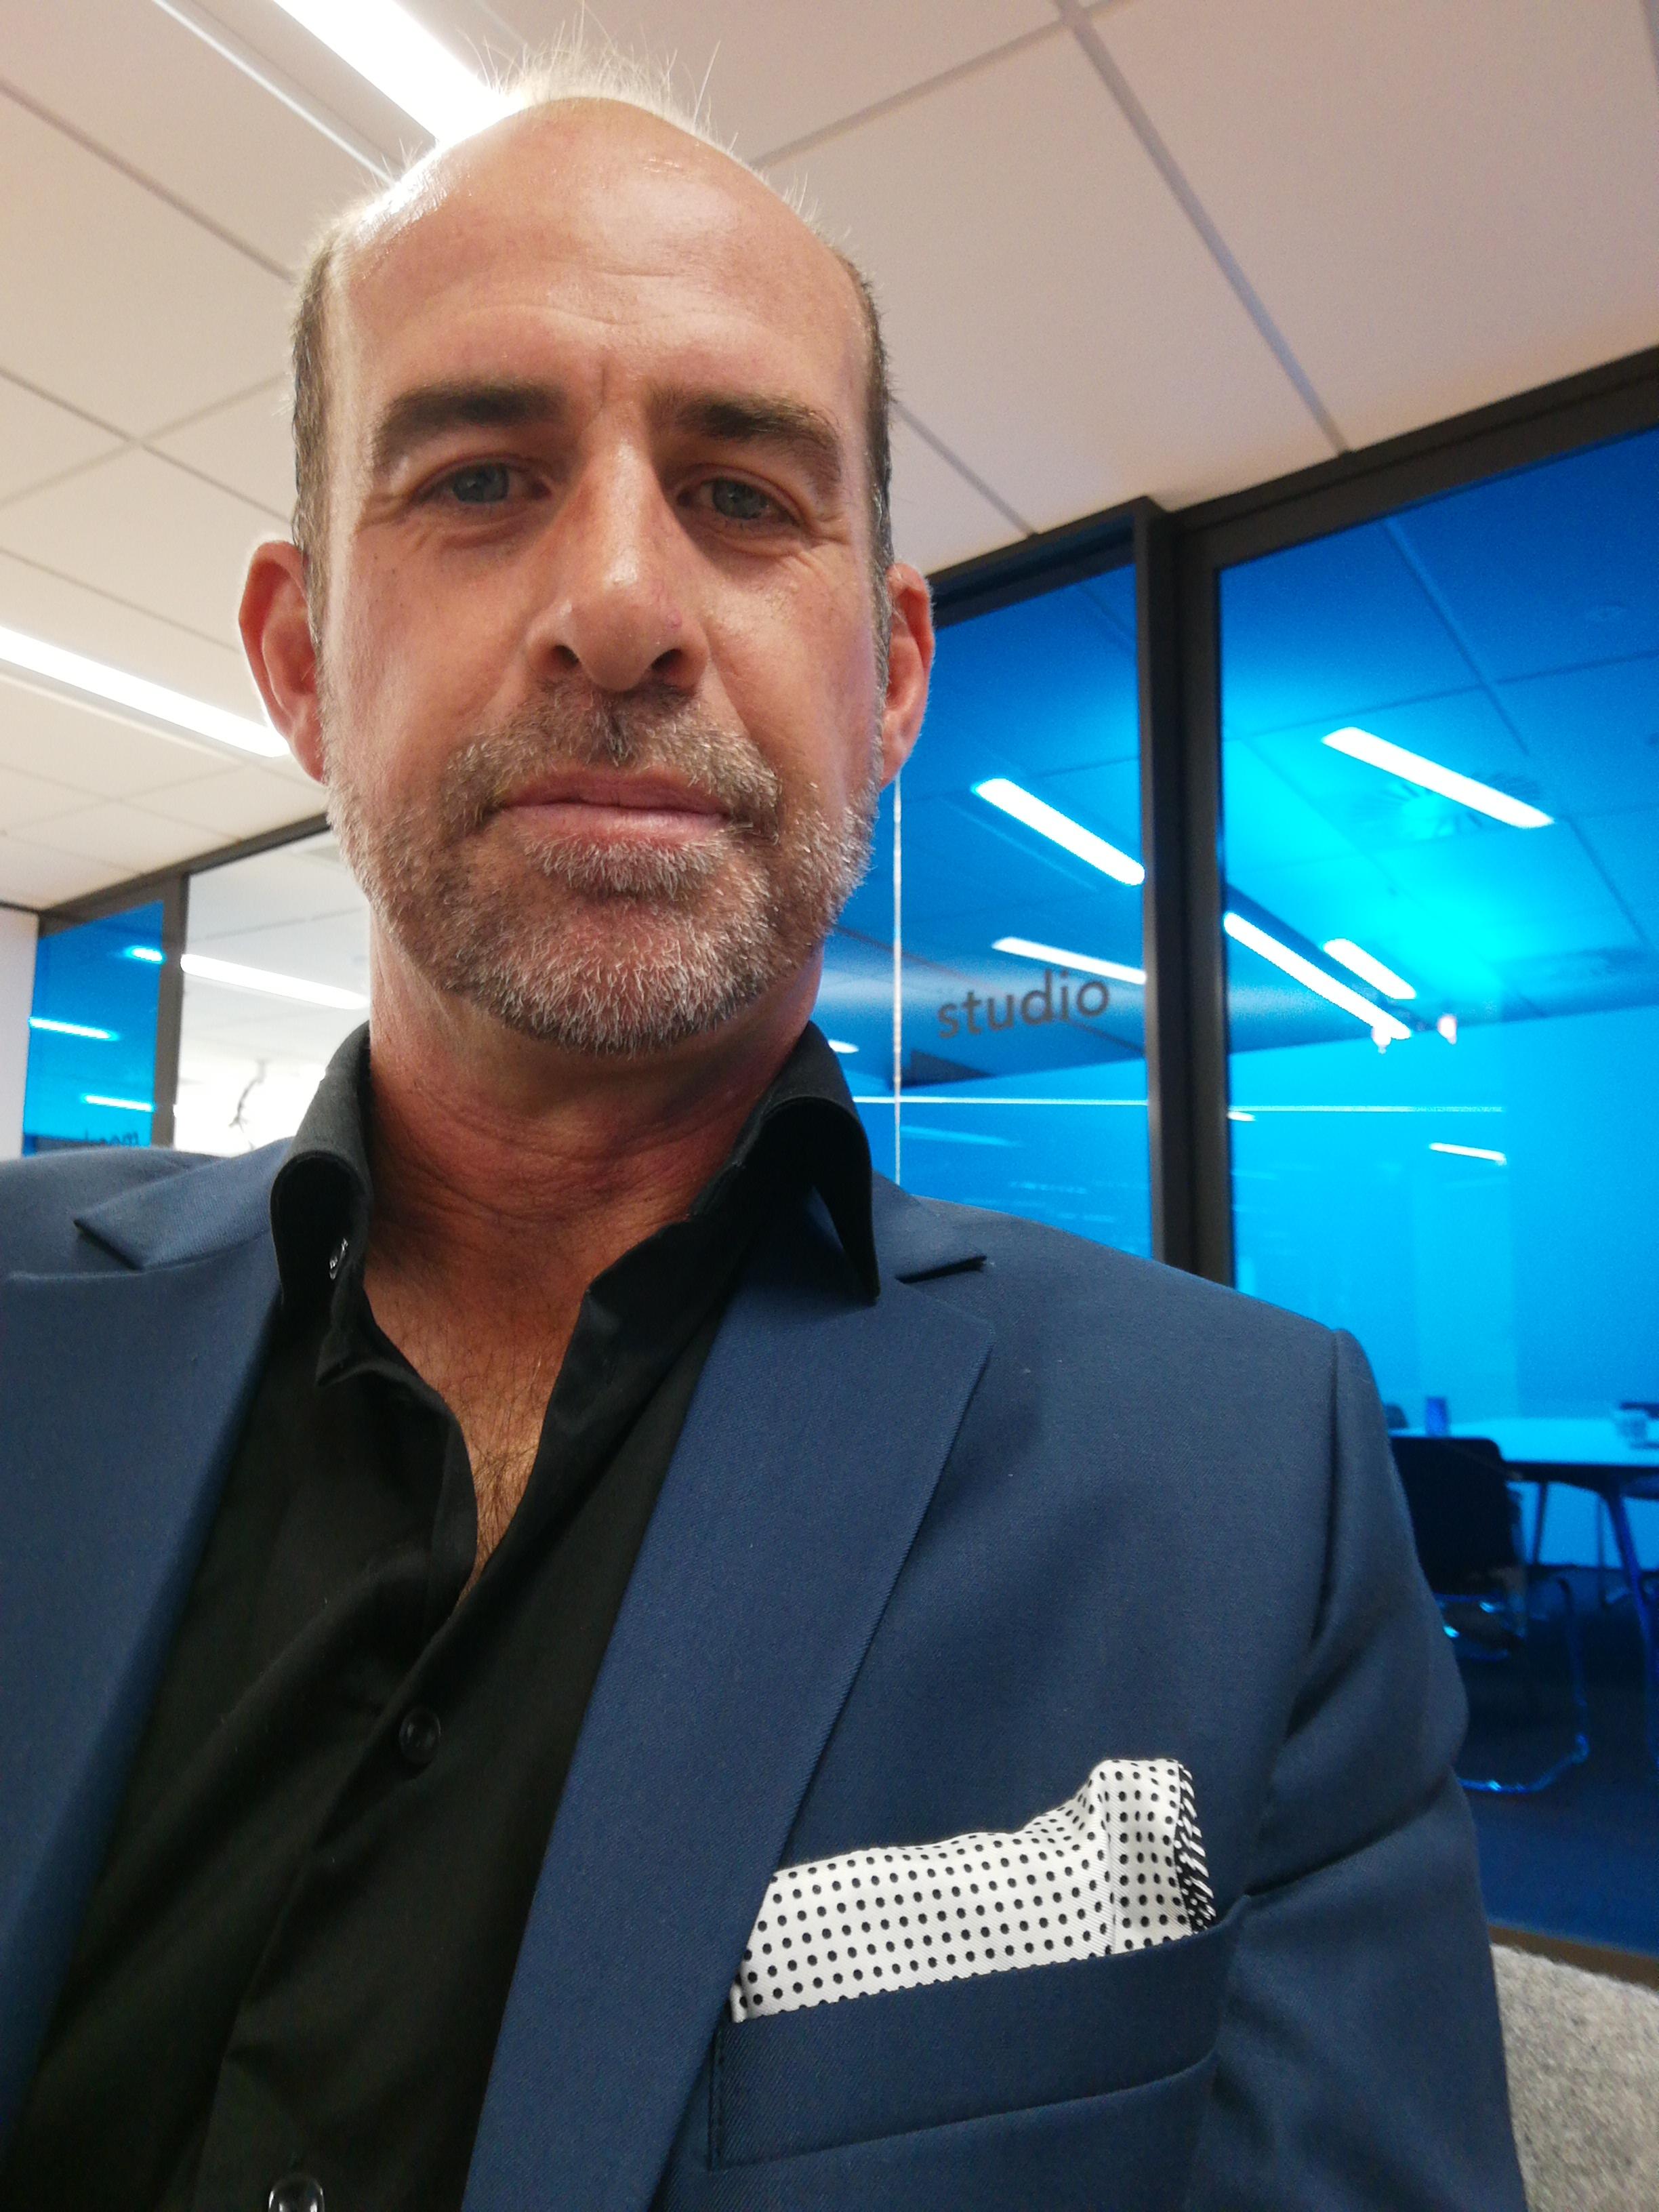 Digital Marketing for Accountants   JohnMaybury.com